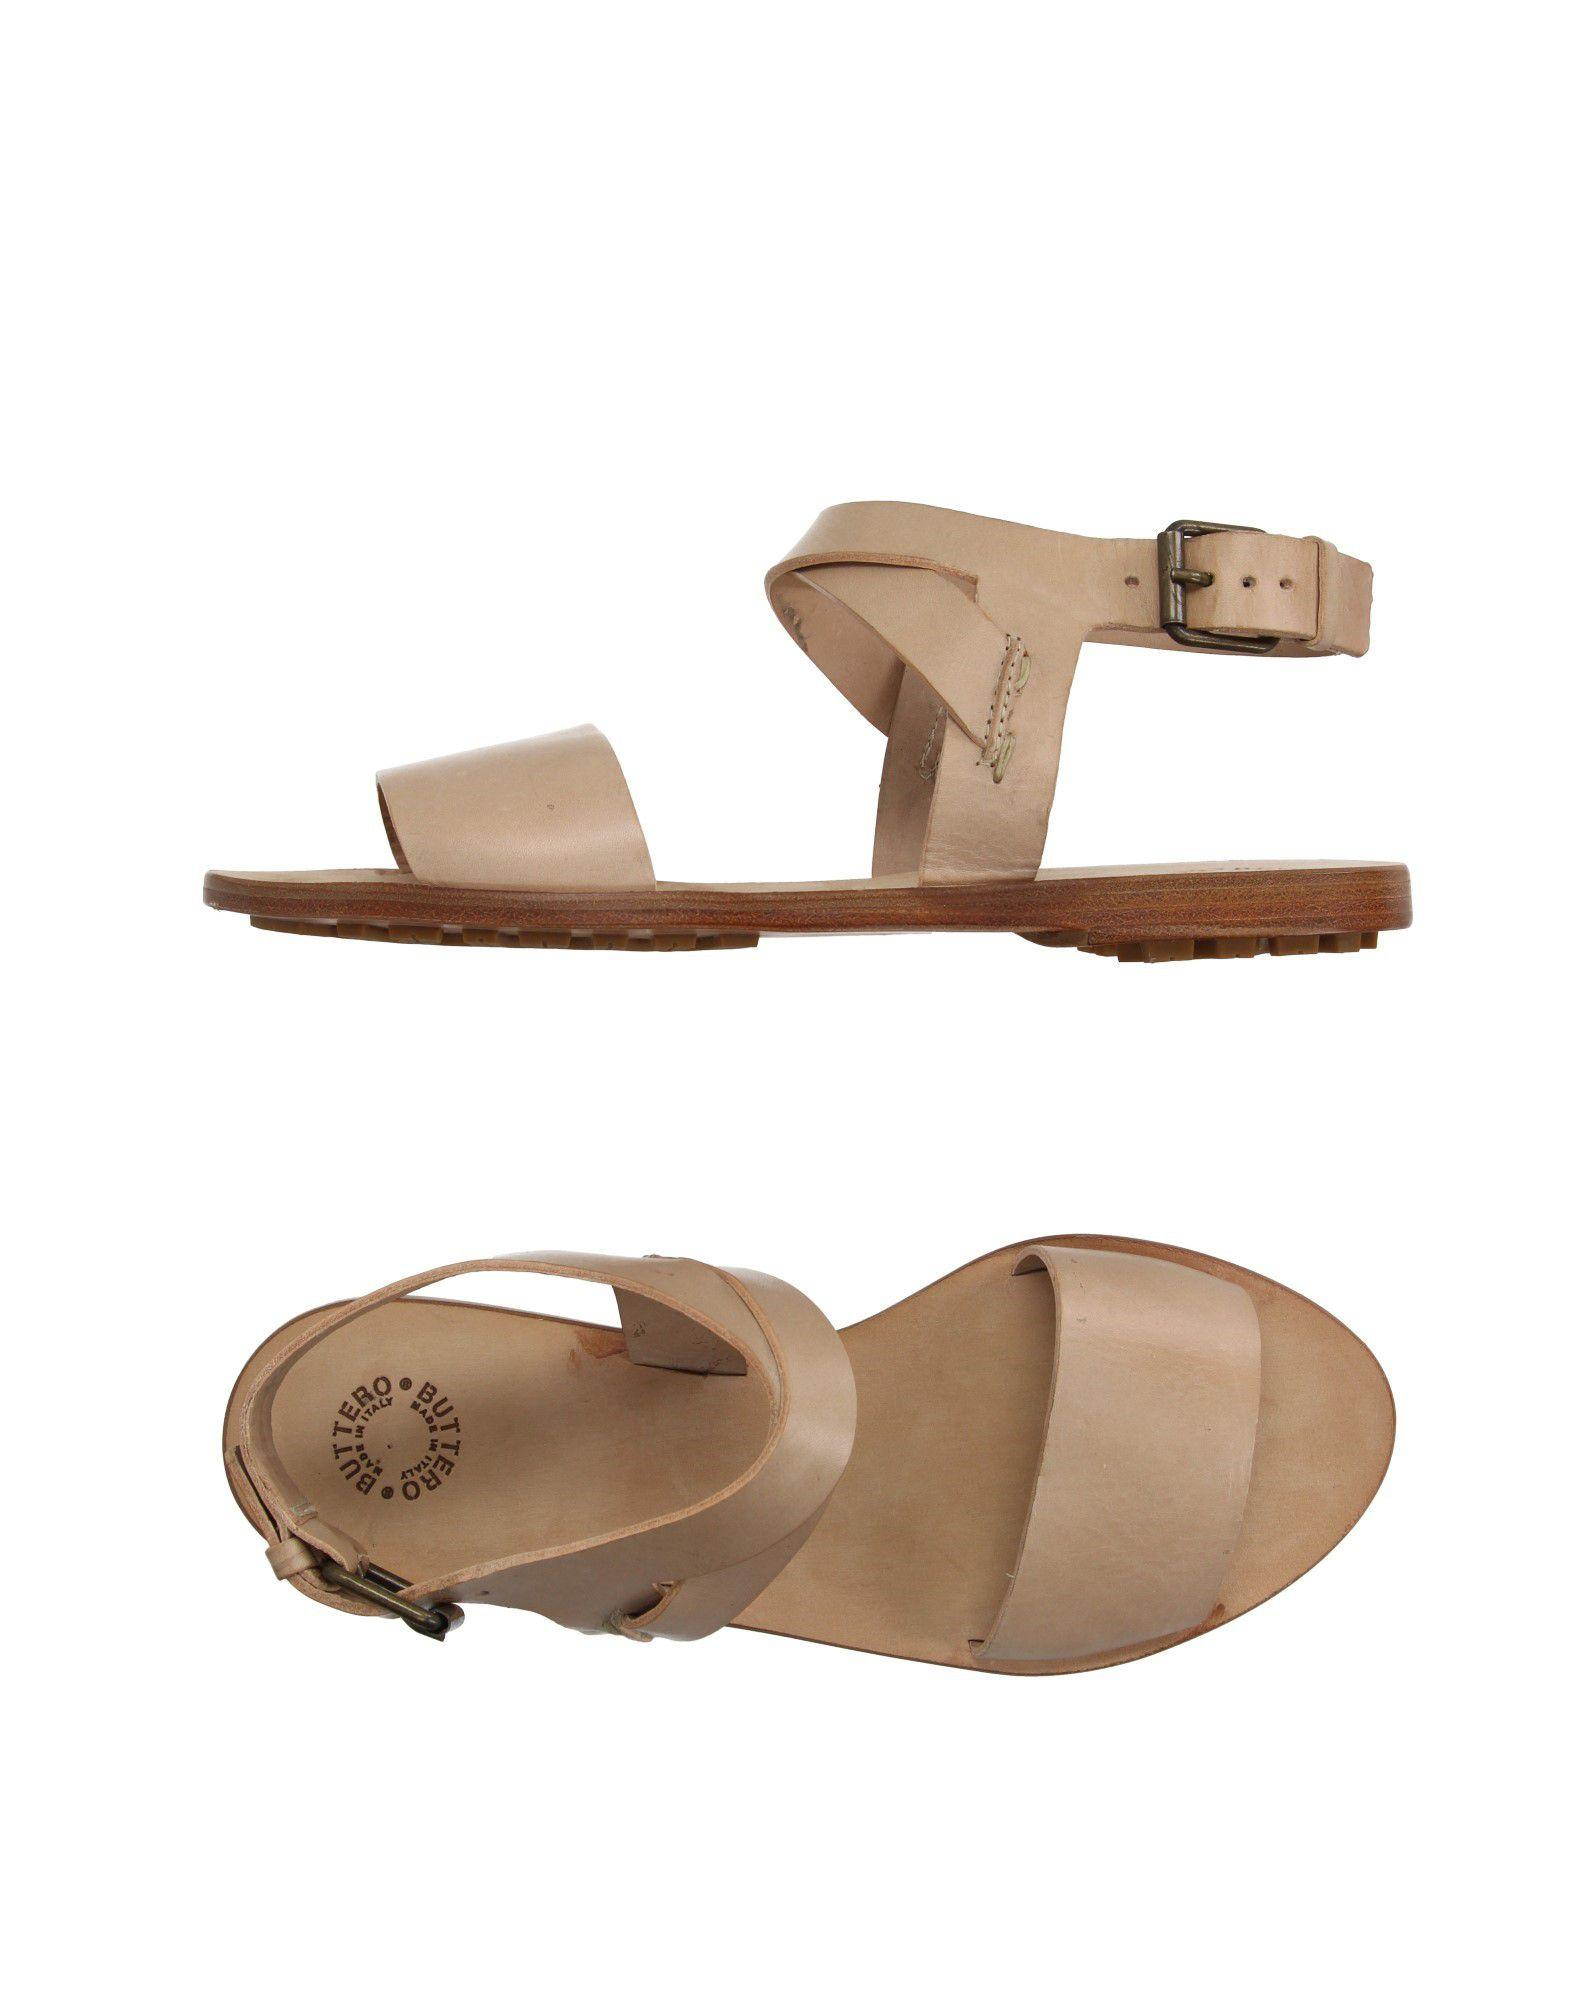 Buttero ® Sandals In Beige